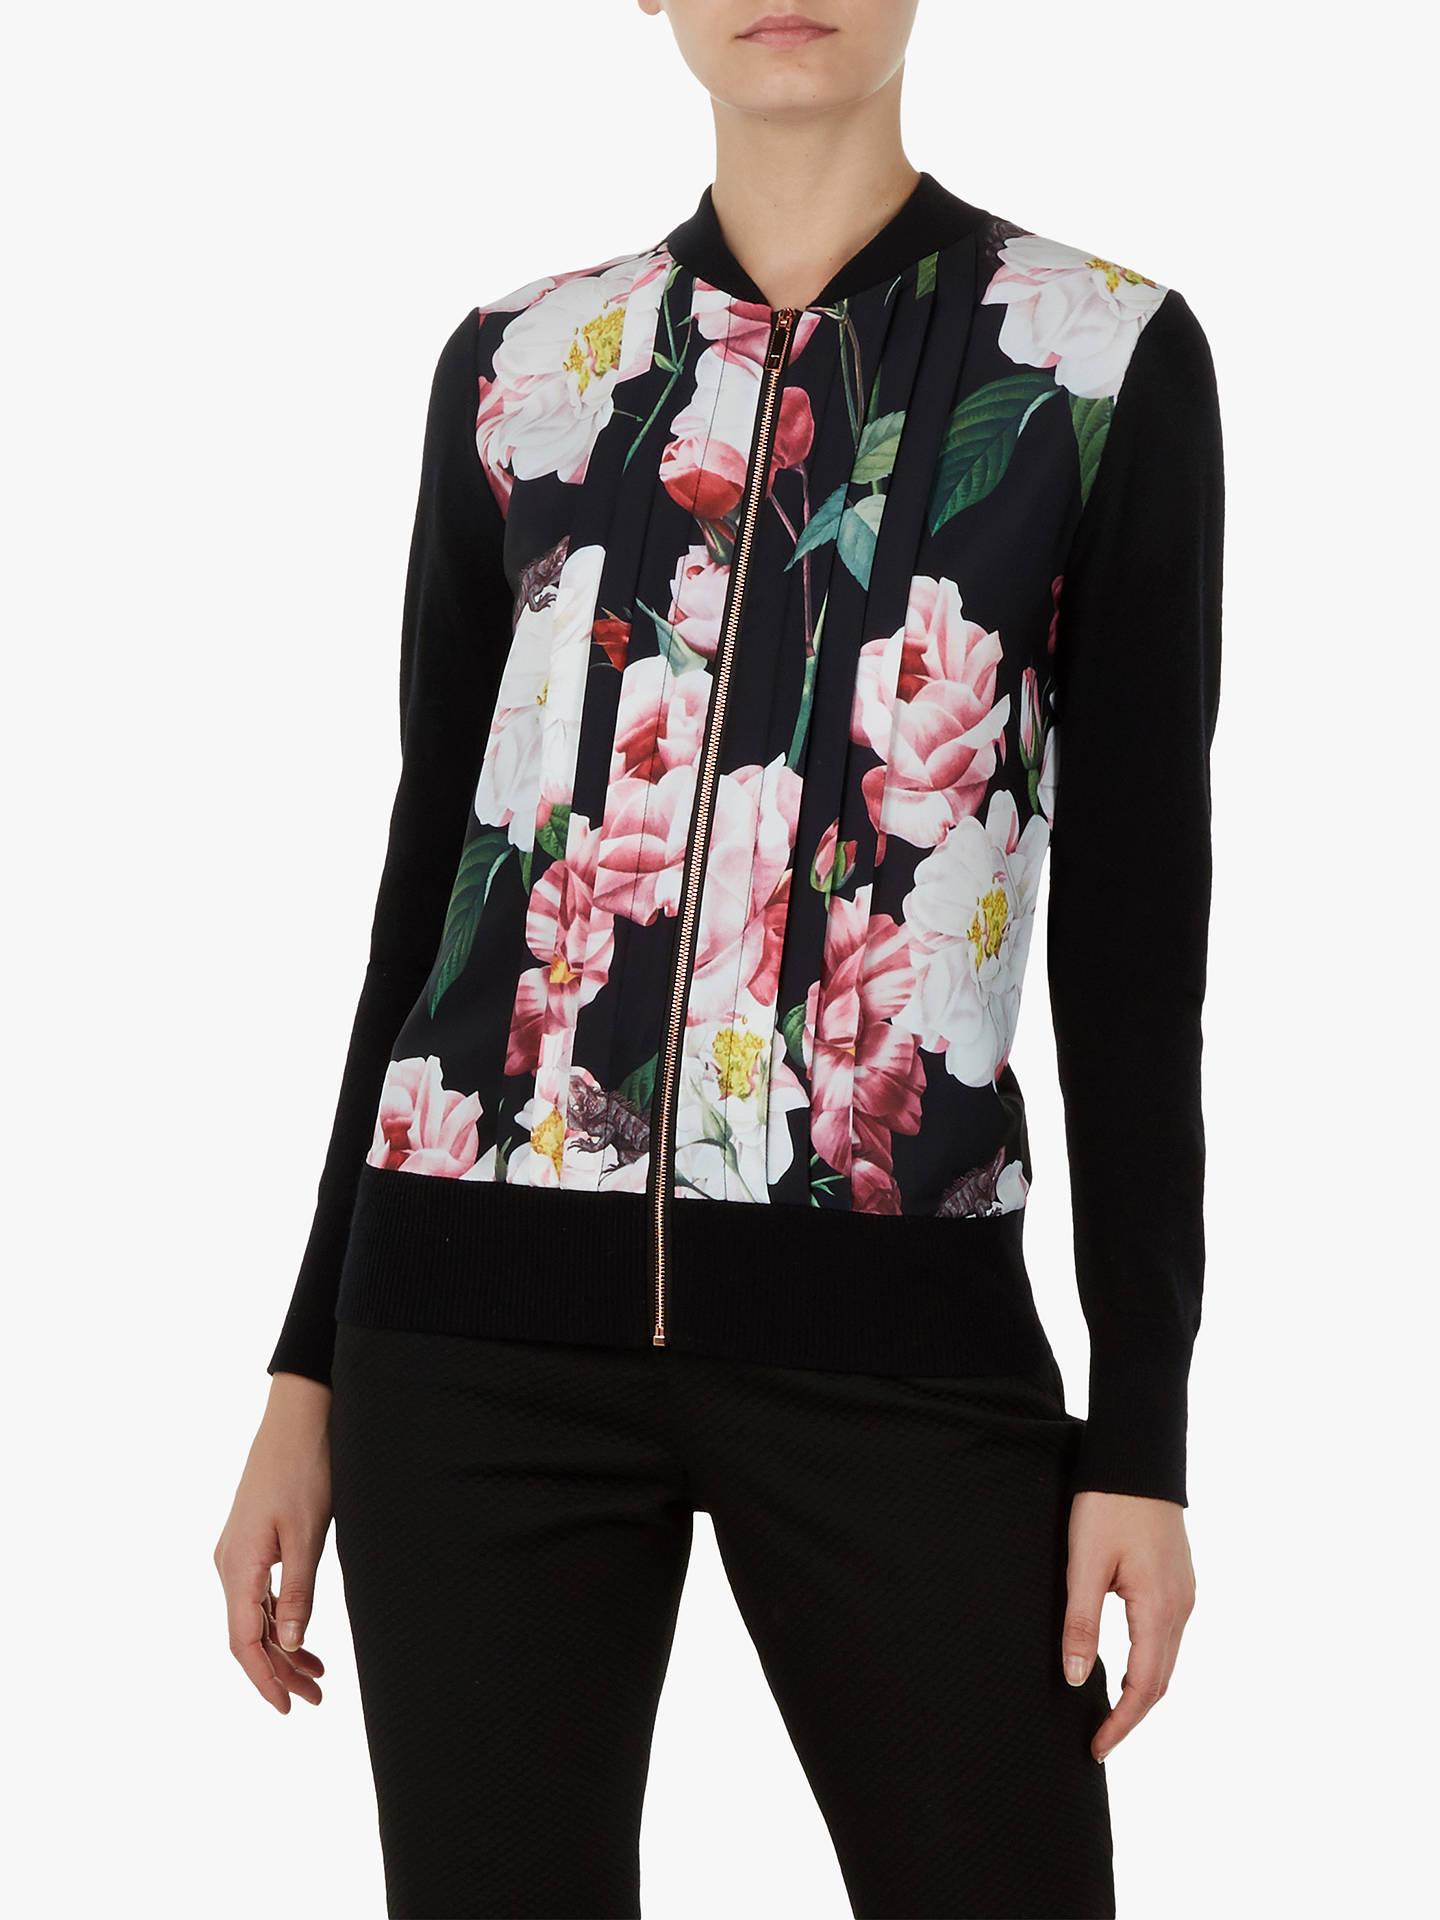 679408c09e5cc Buy Ted Baker Jaymiey Floral Bomber Jacket